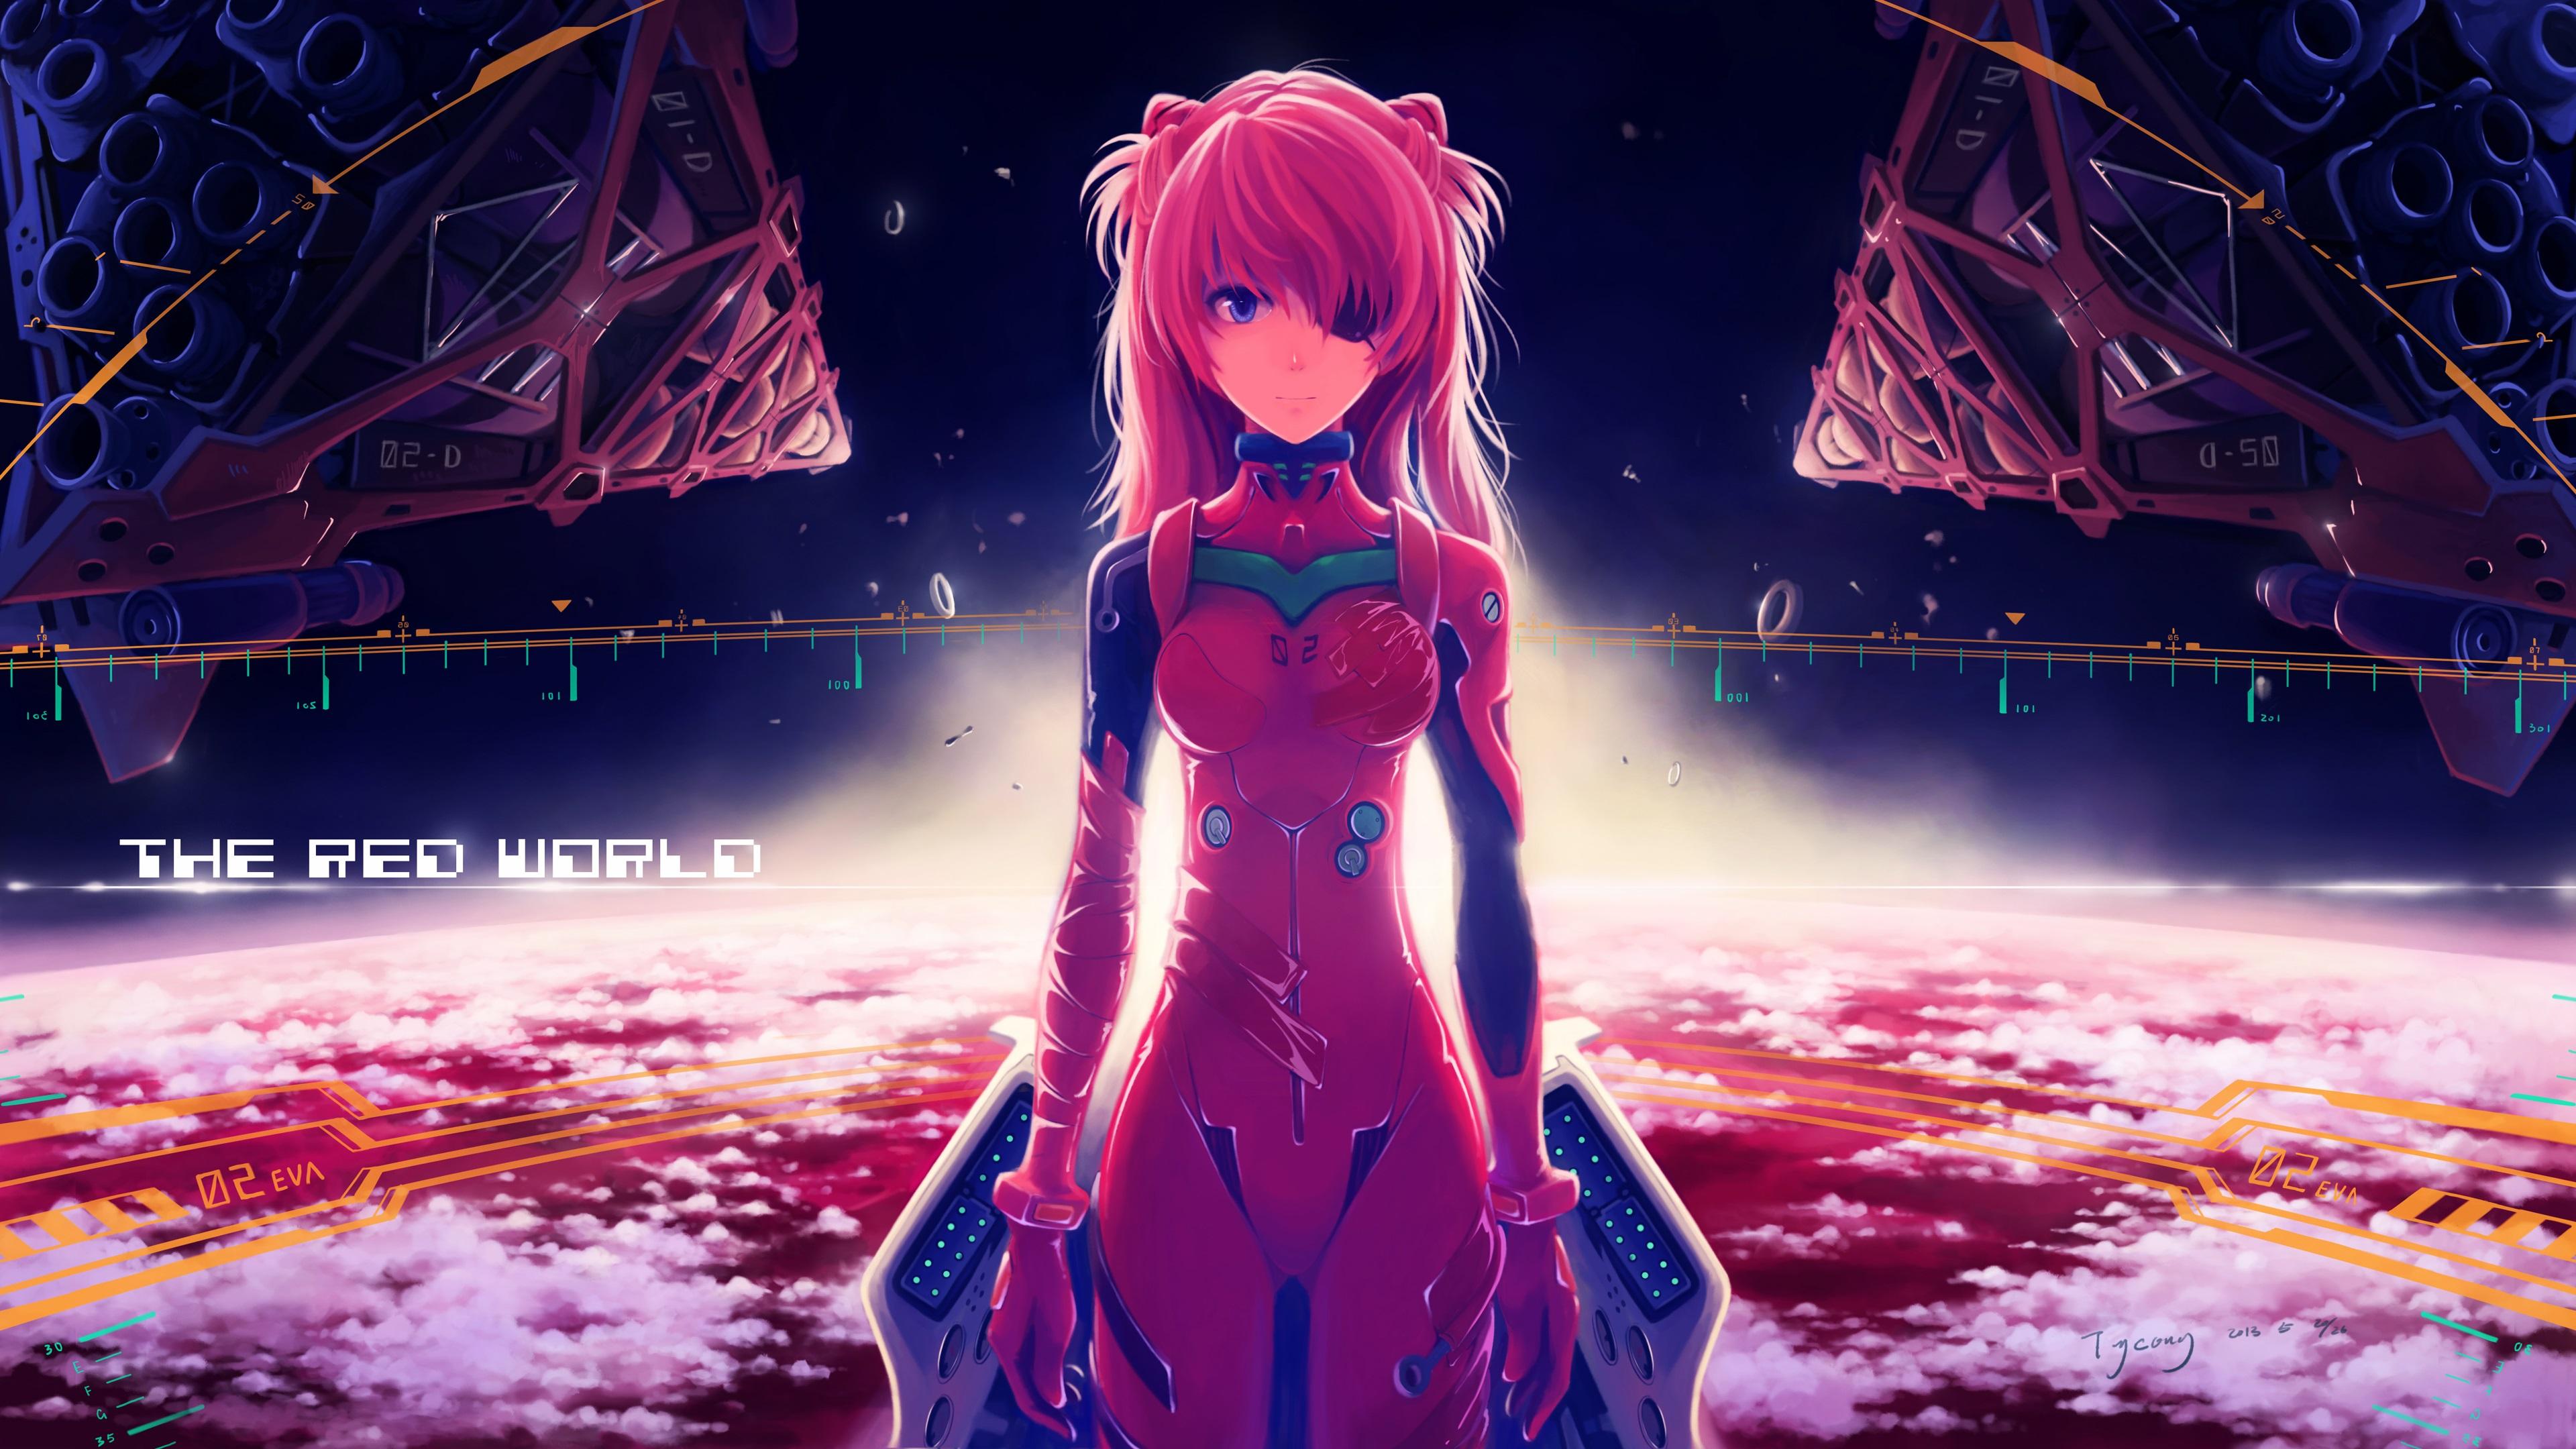 Wallpaper Neon Genesis Evangelion The Red World 3840x2160 Uhd 4k Picture Image